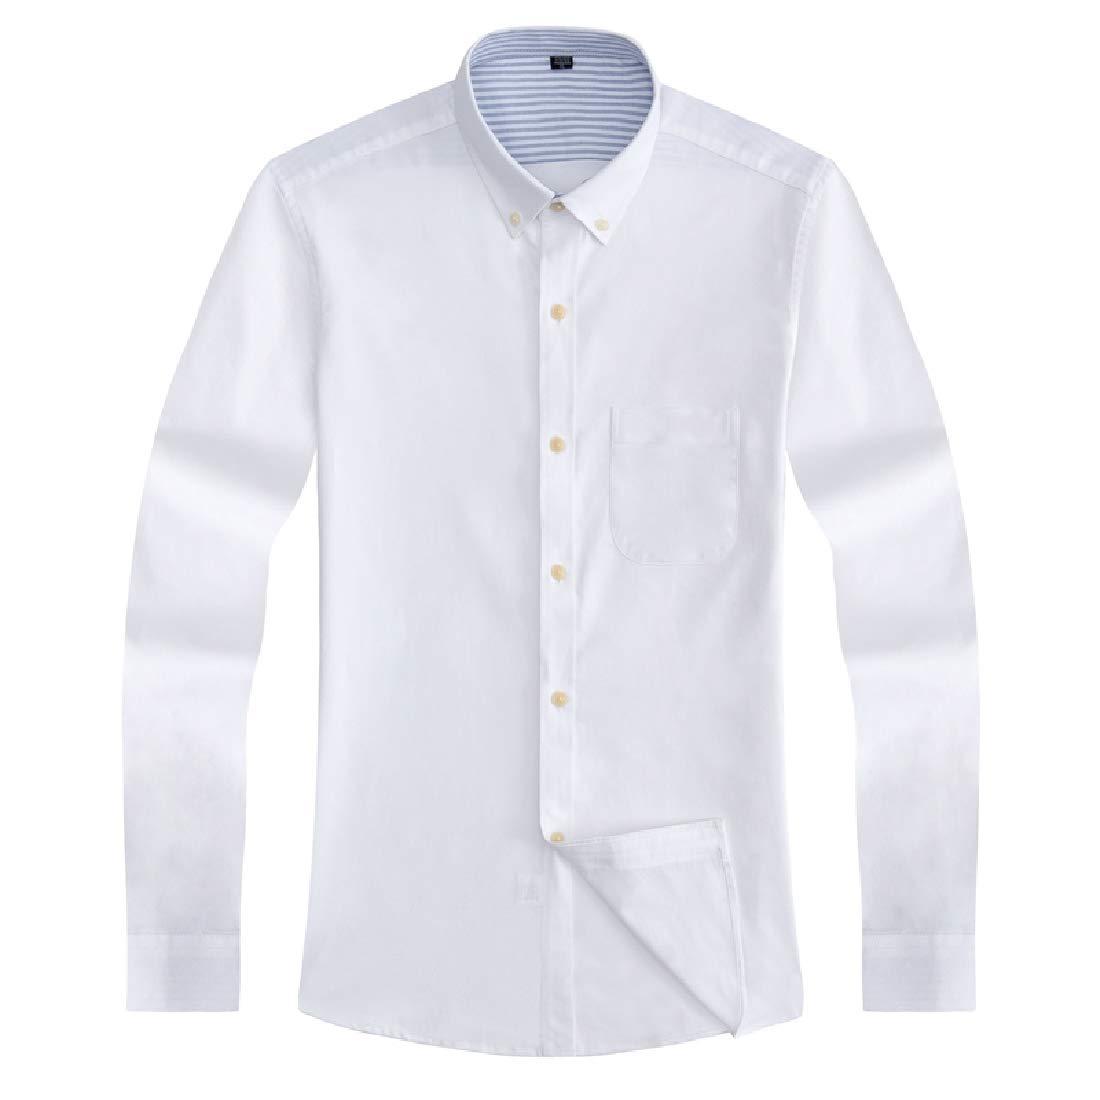 Domple Men Casual Business Cotton Long Sleeve Button Down Dress Oxford Shirt